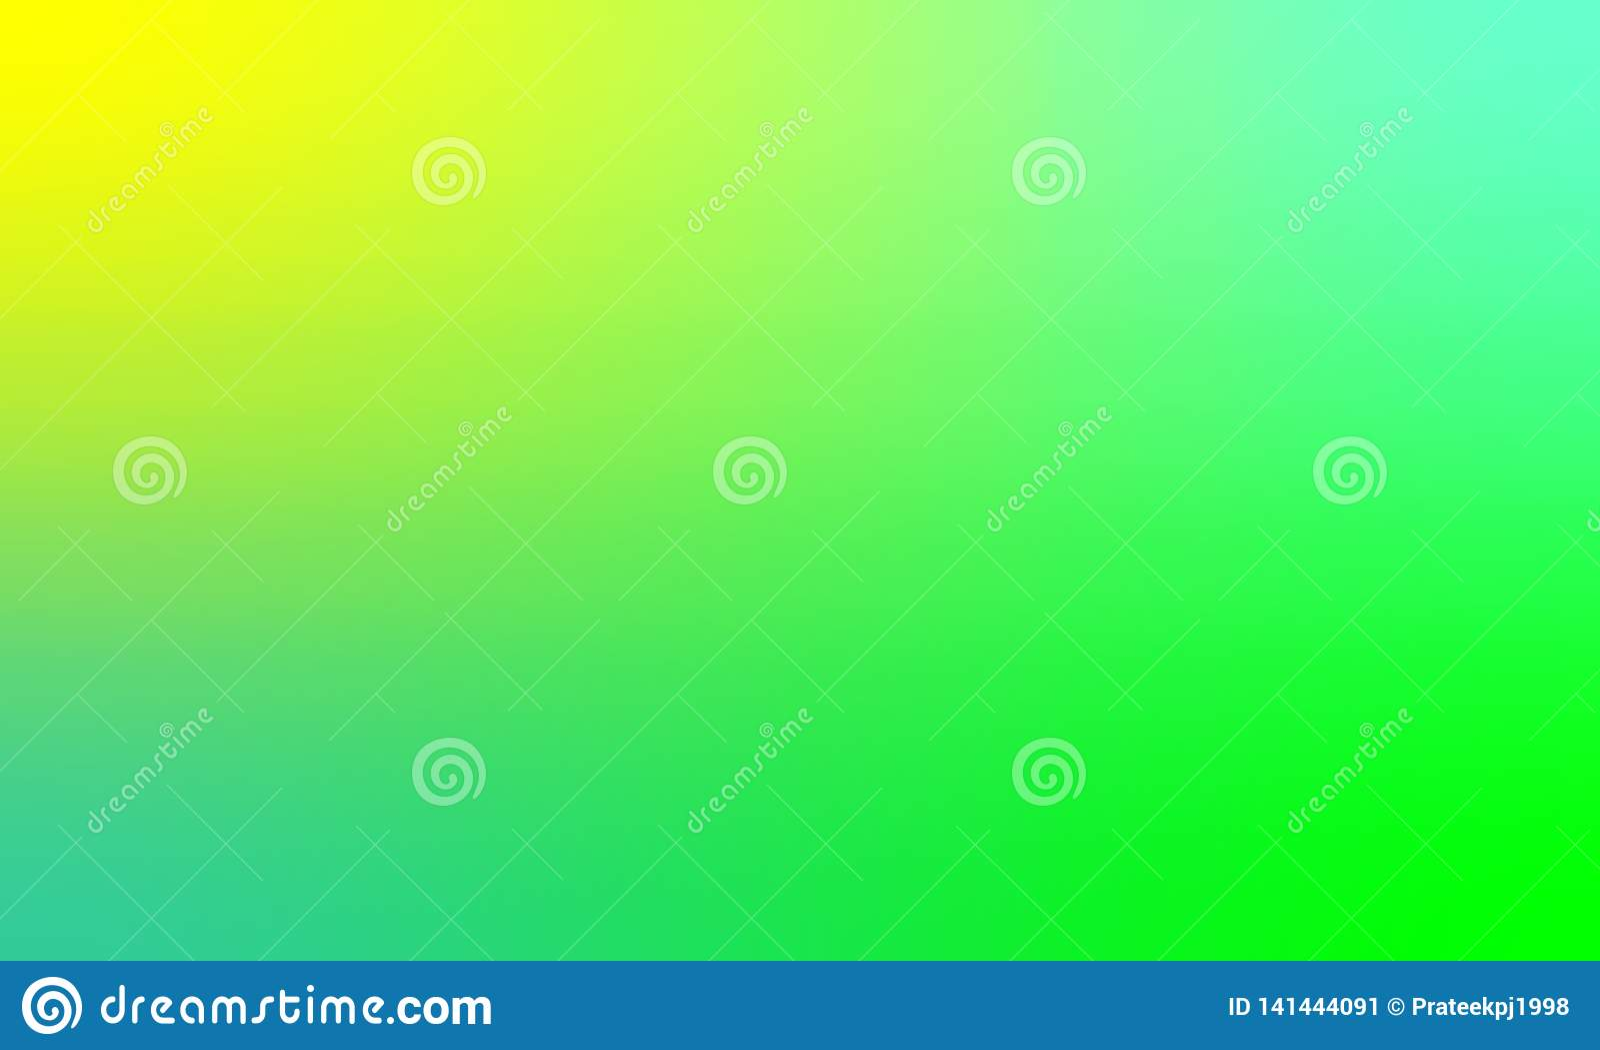 Colorful blur texture background vector design, colorful blurred shaded background, vivid color vector illustration. Closeup, bac